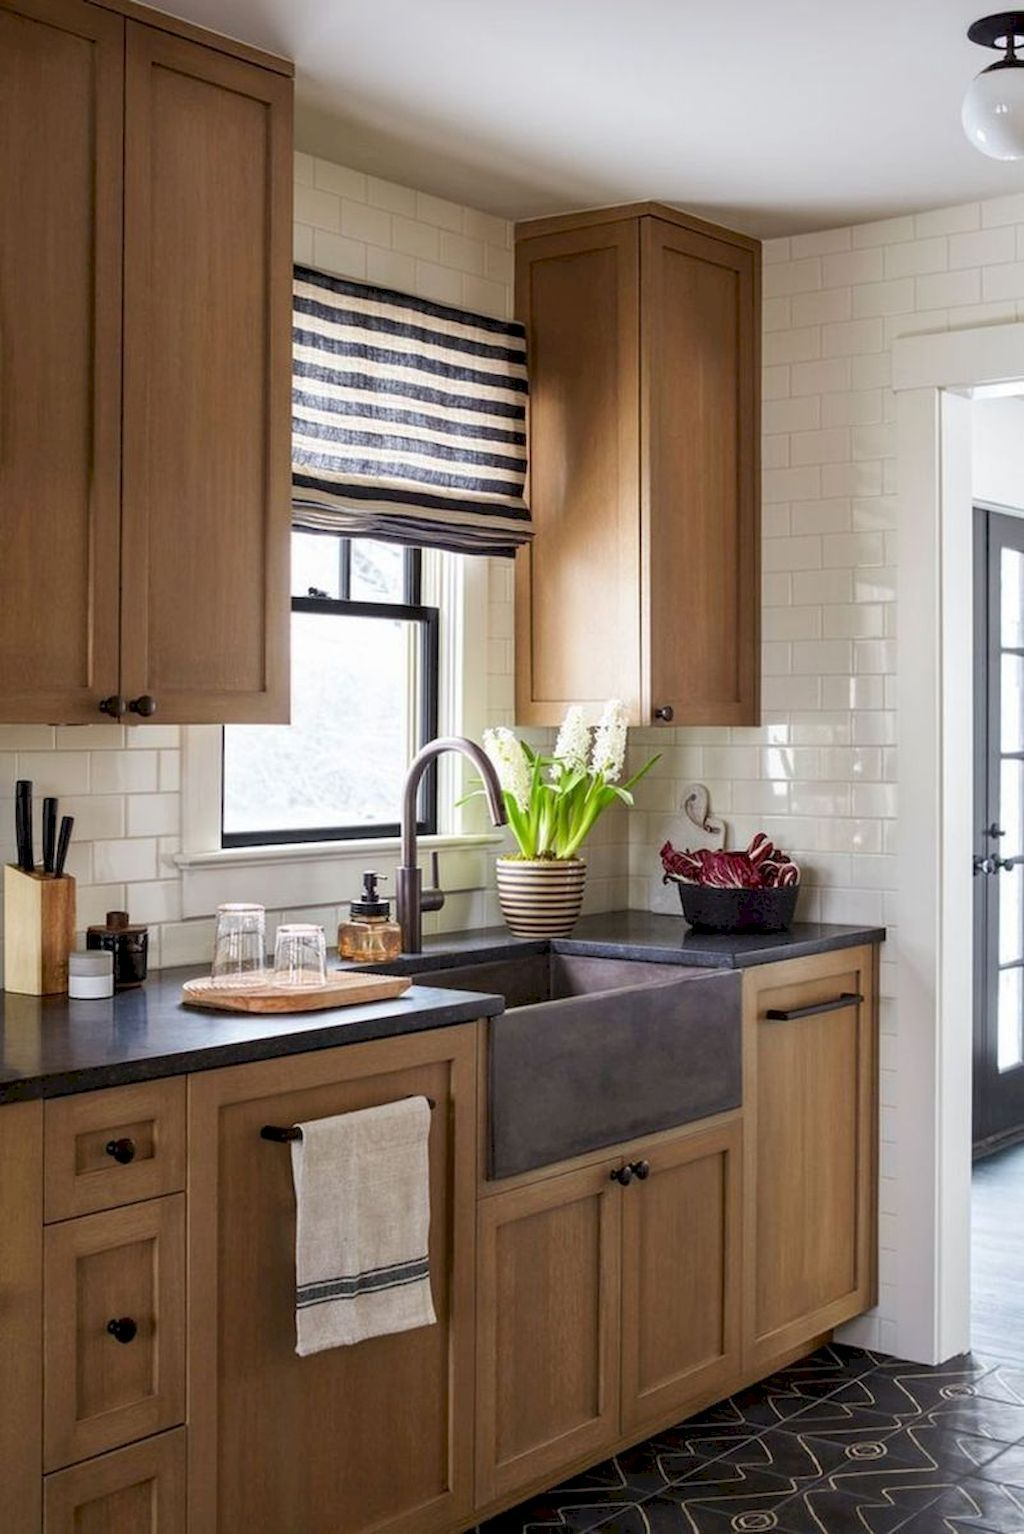 Modern Farmhouse Kitchen Cabinets home decor inspiration   shairoom.in 2020 | Farmhouse style